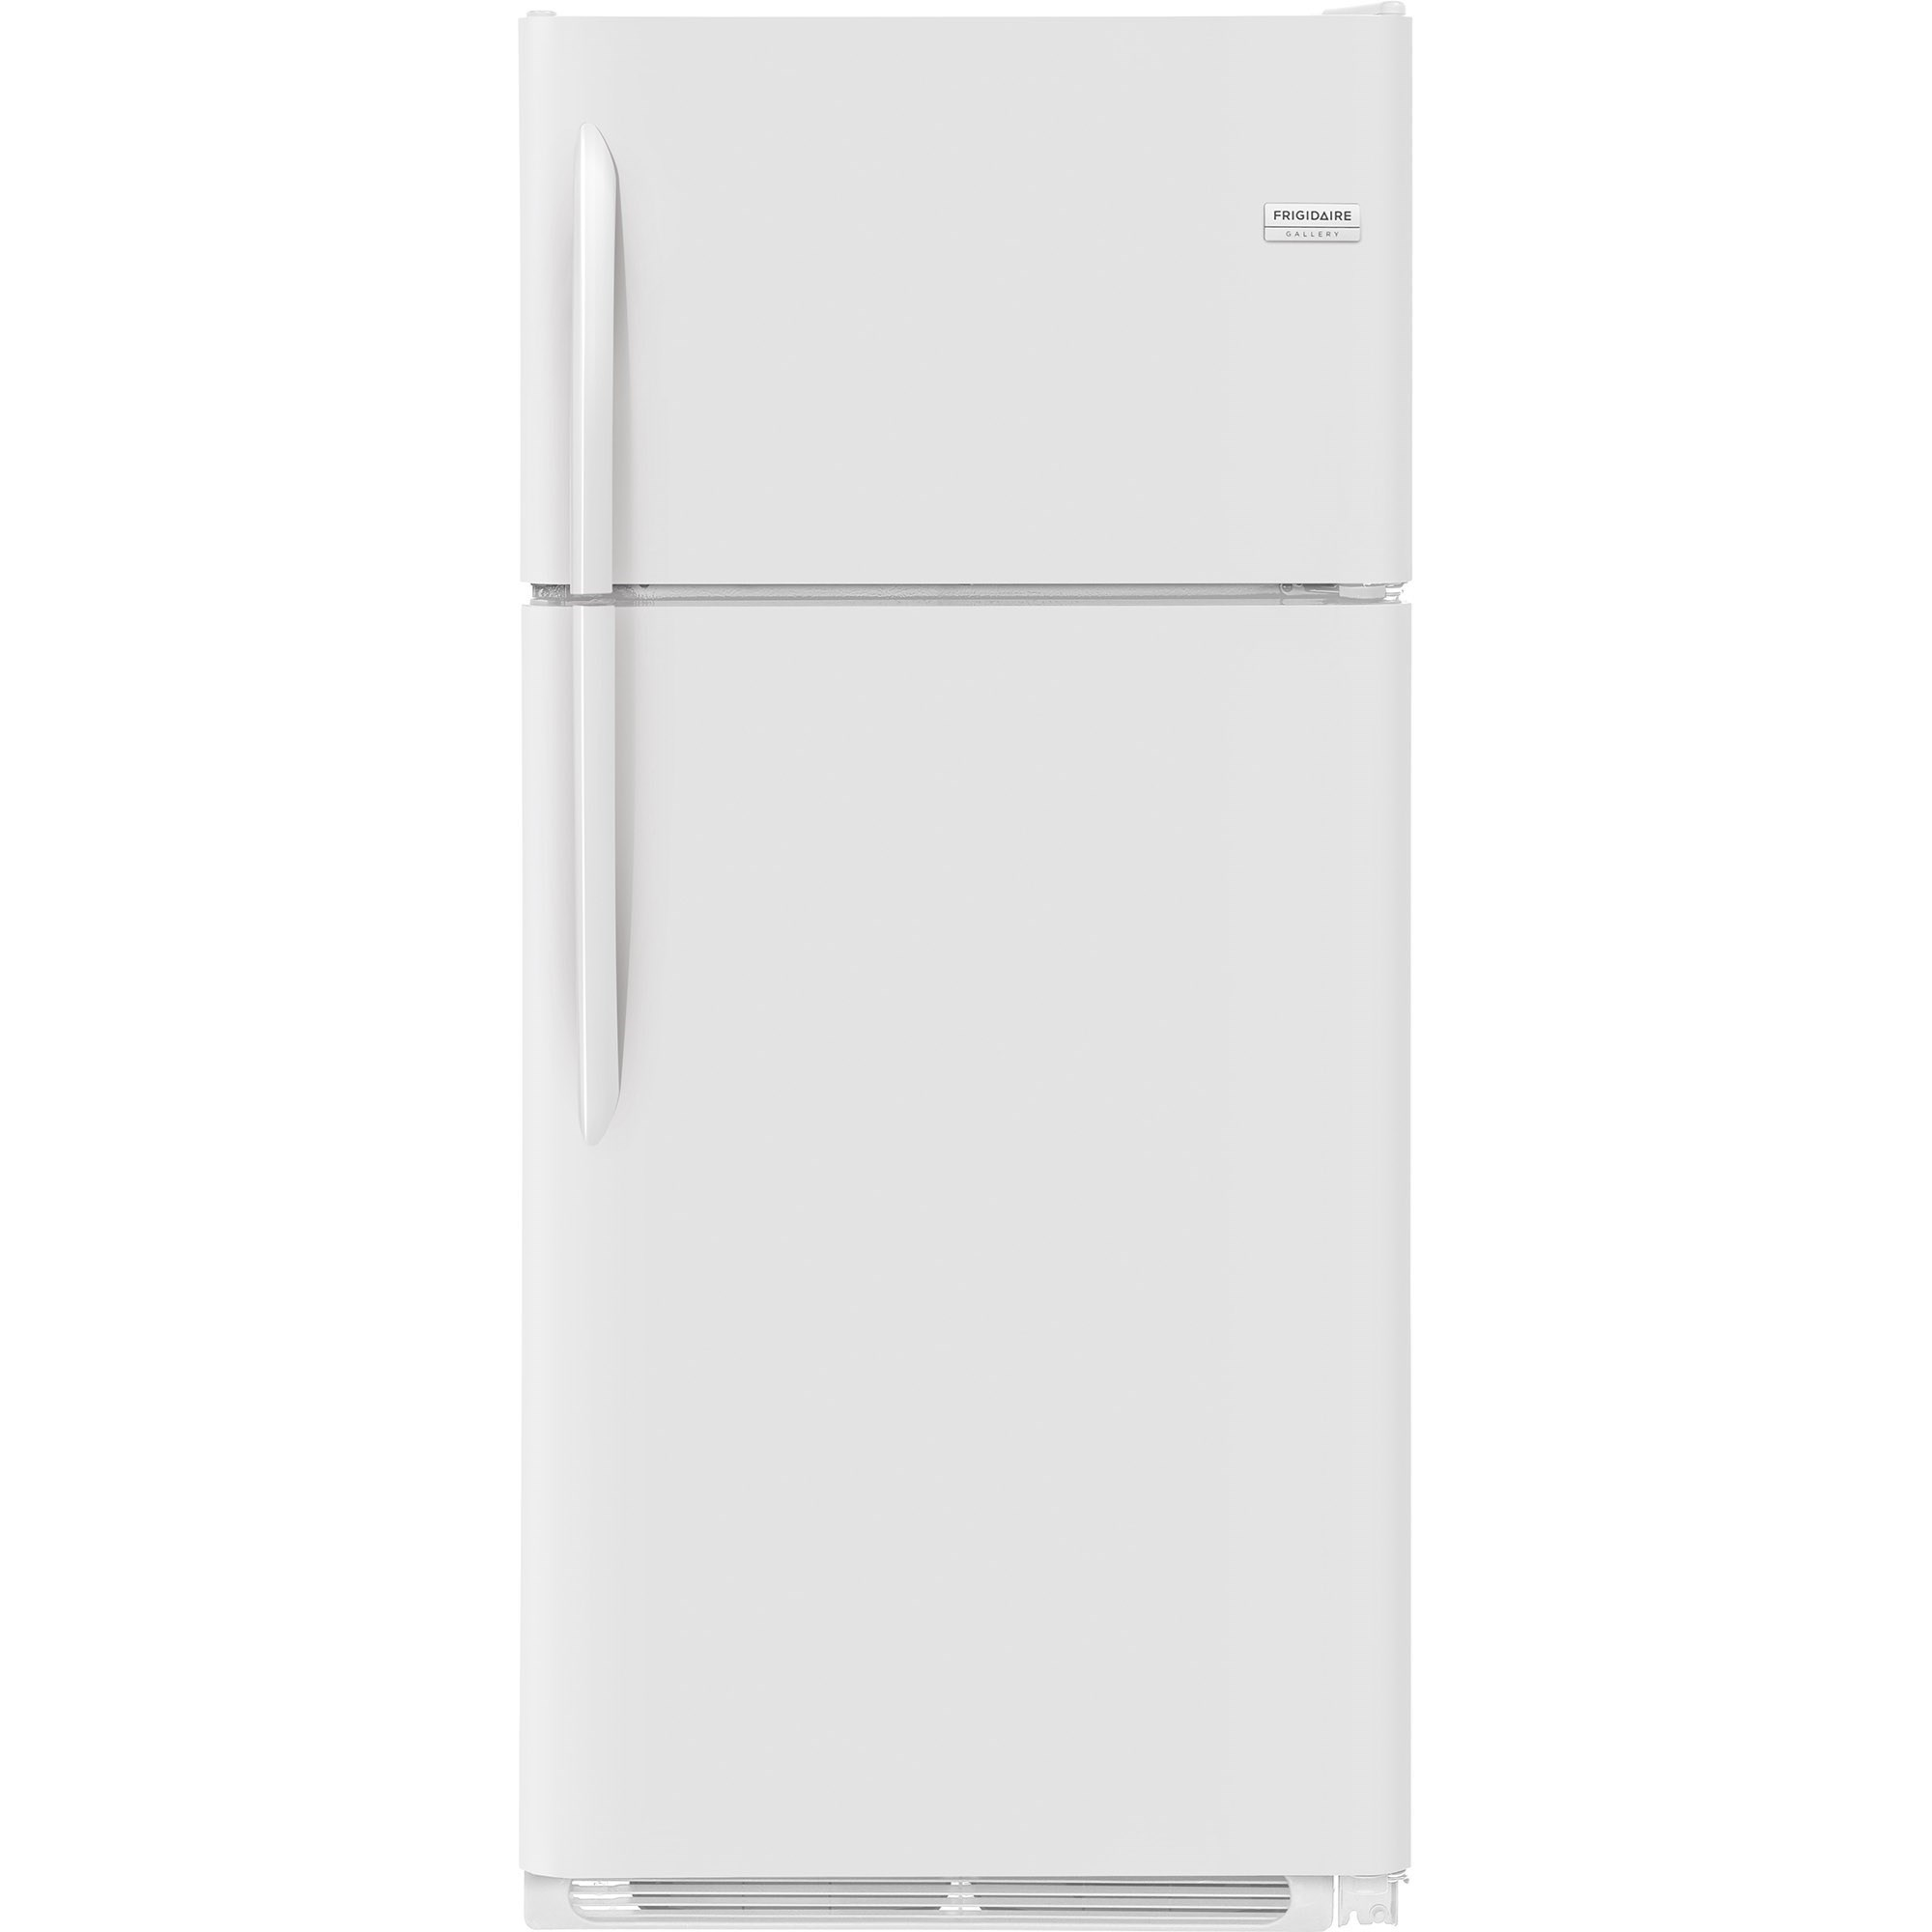 frigidaire fgtr1837tp18 0 cu ft top freezer refrigerator furniture and appliancemart. Black Bedroom Furniture Sets. Home Design Ideas